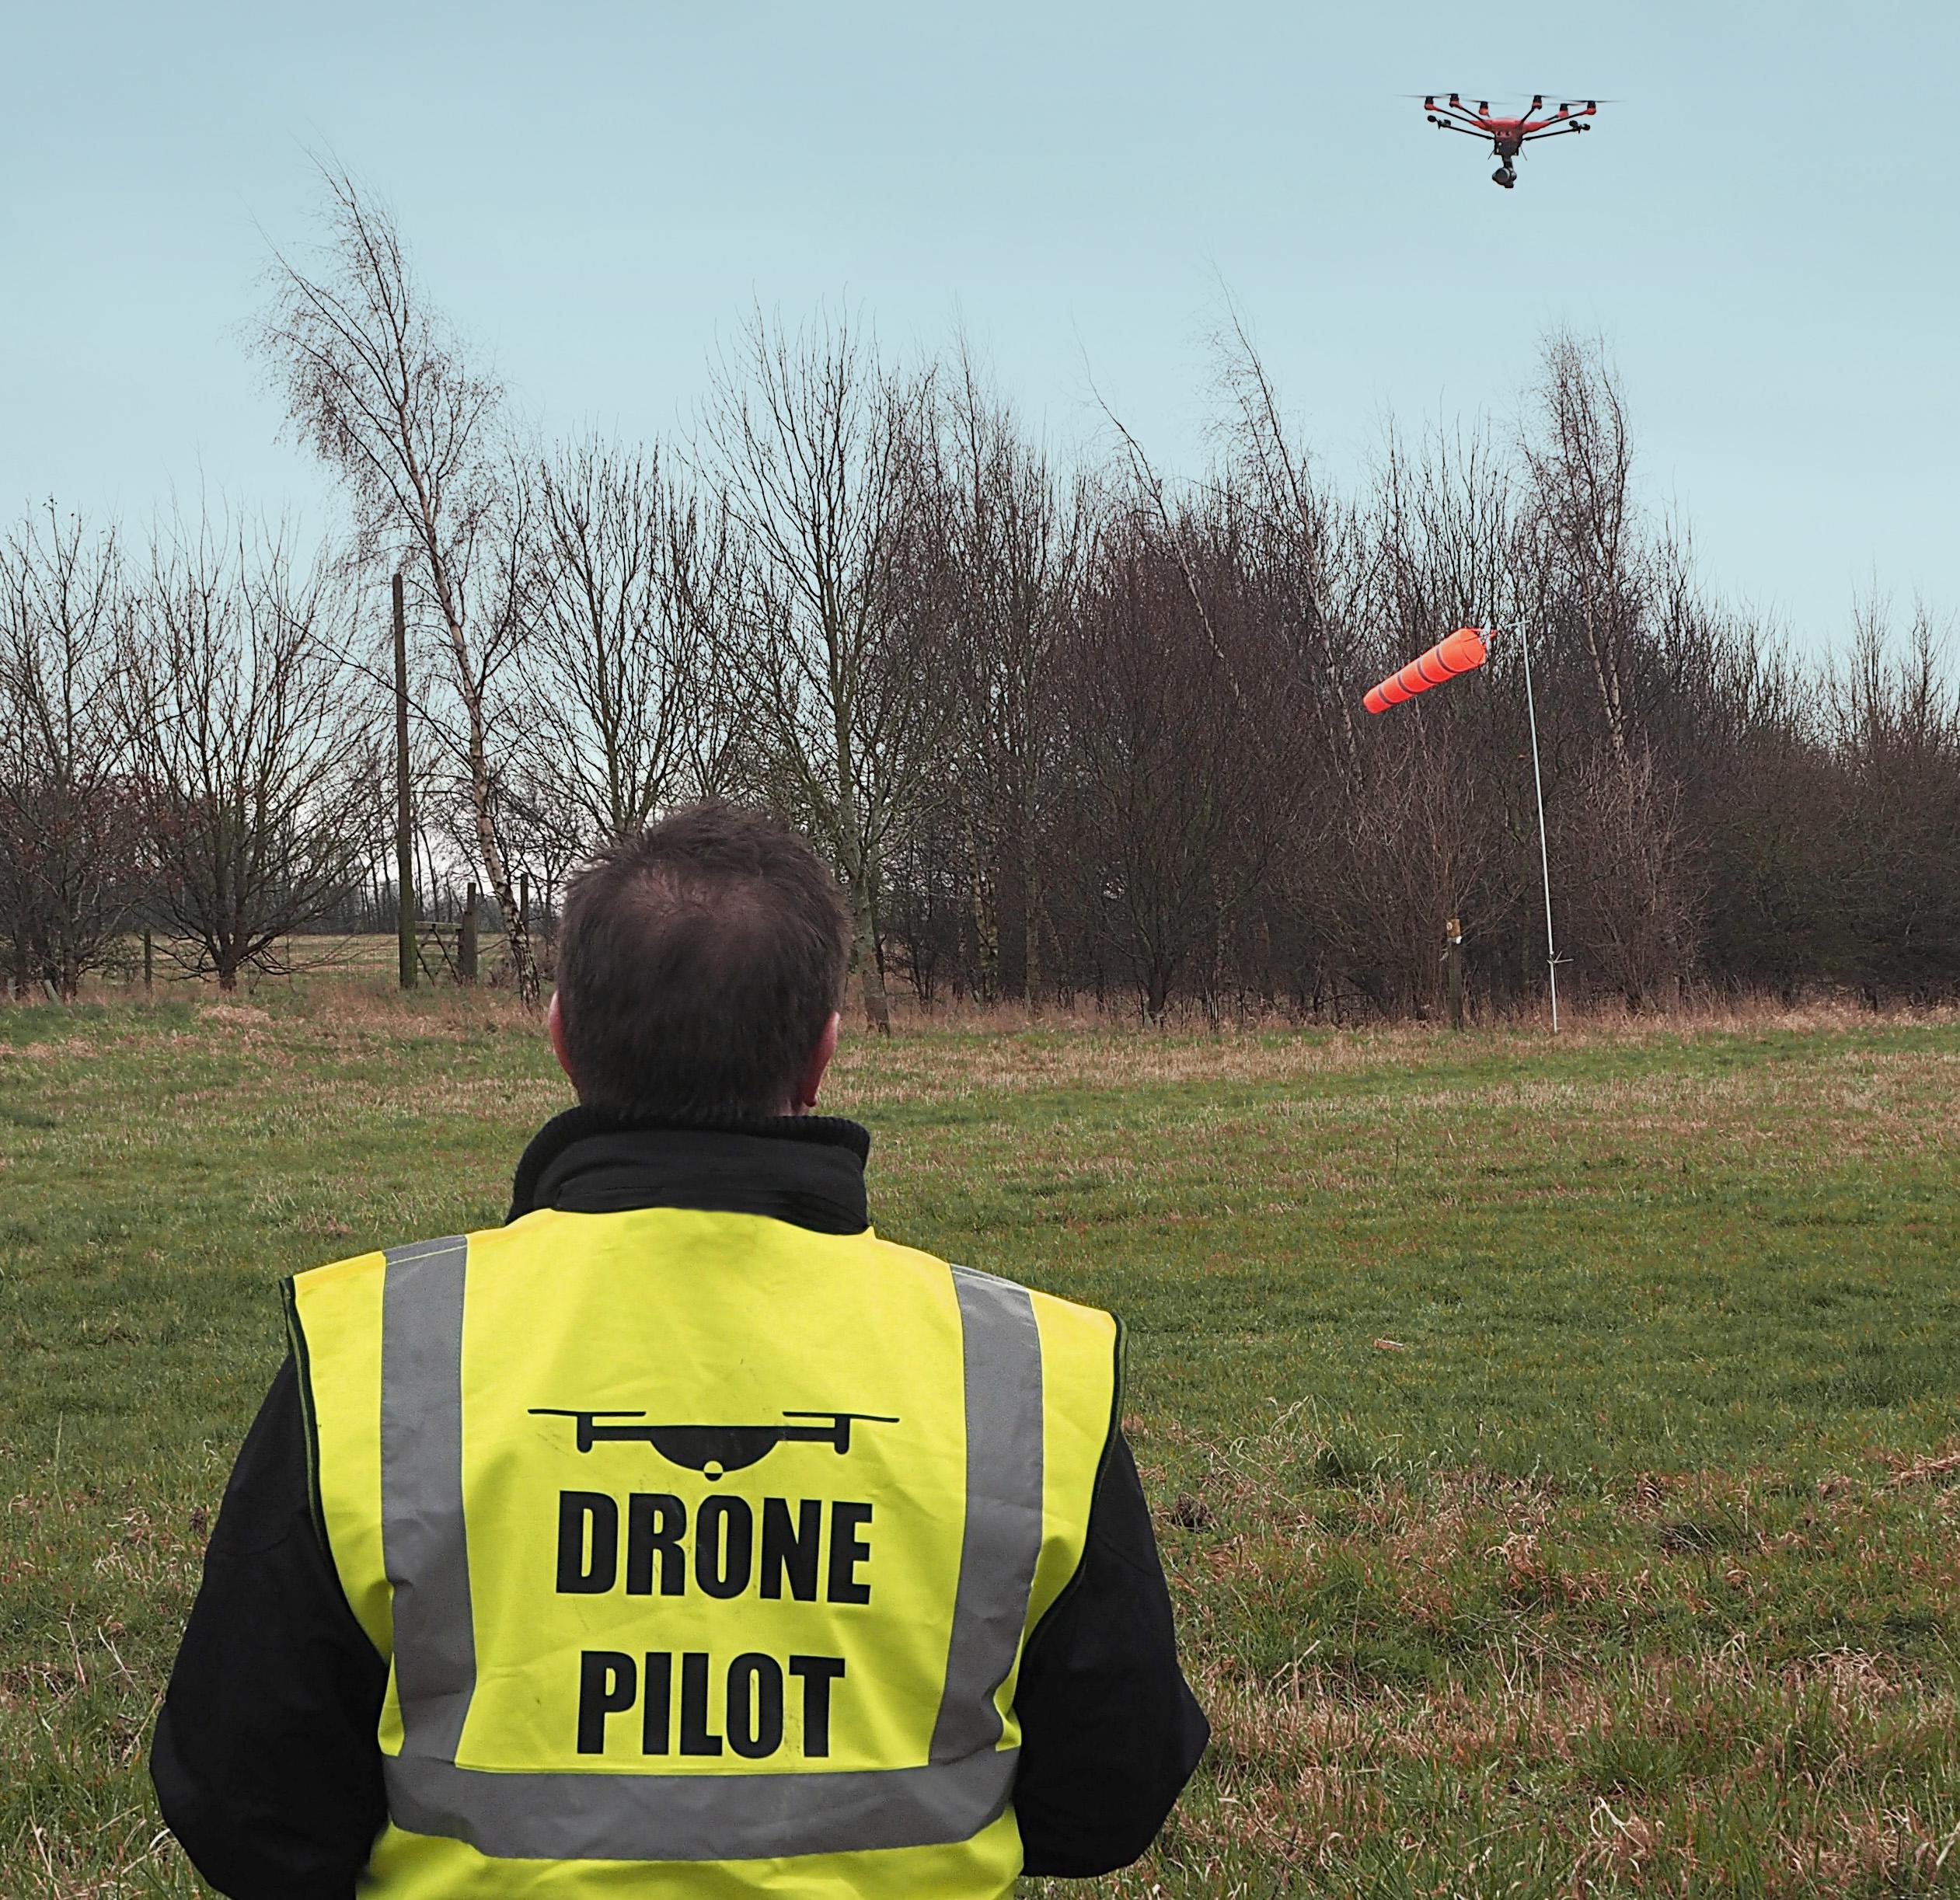 VFR Studios pilot test flies the Yuneec H520 hexacopter drone